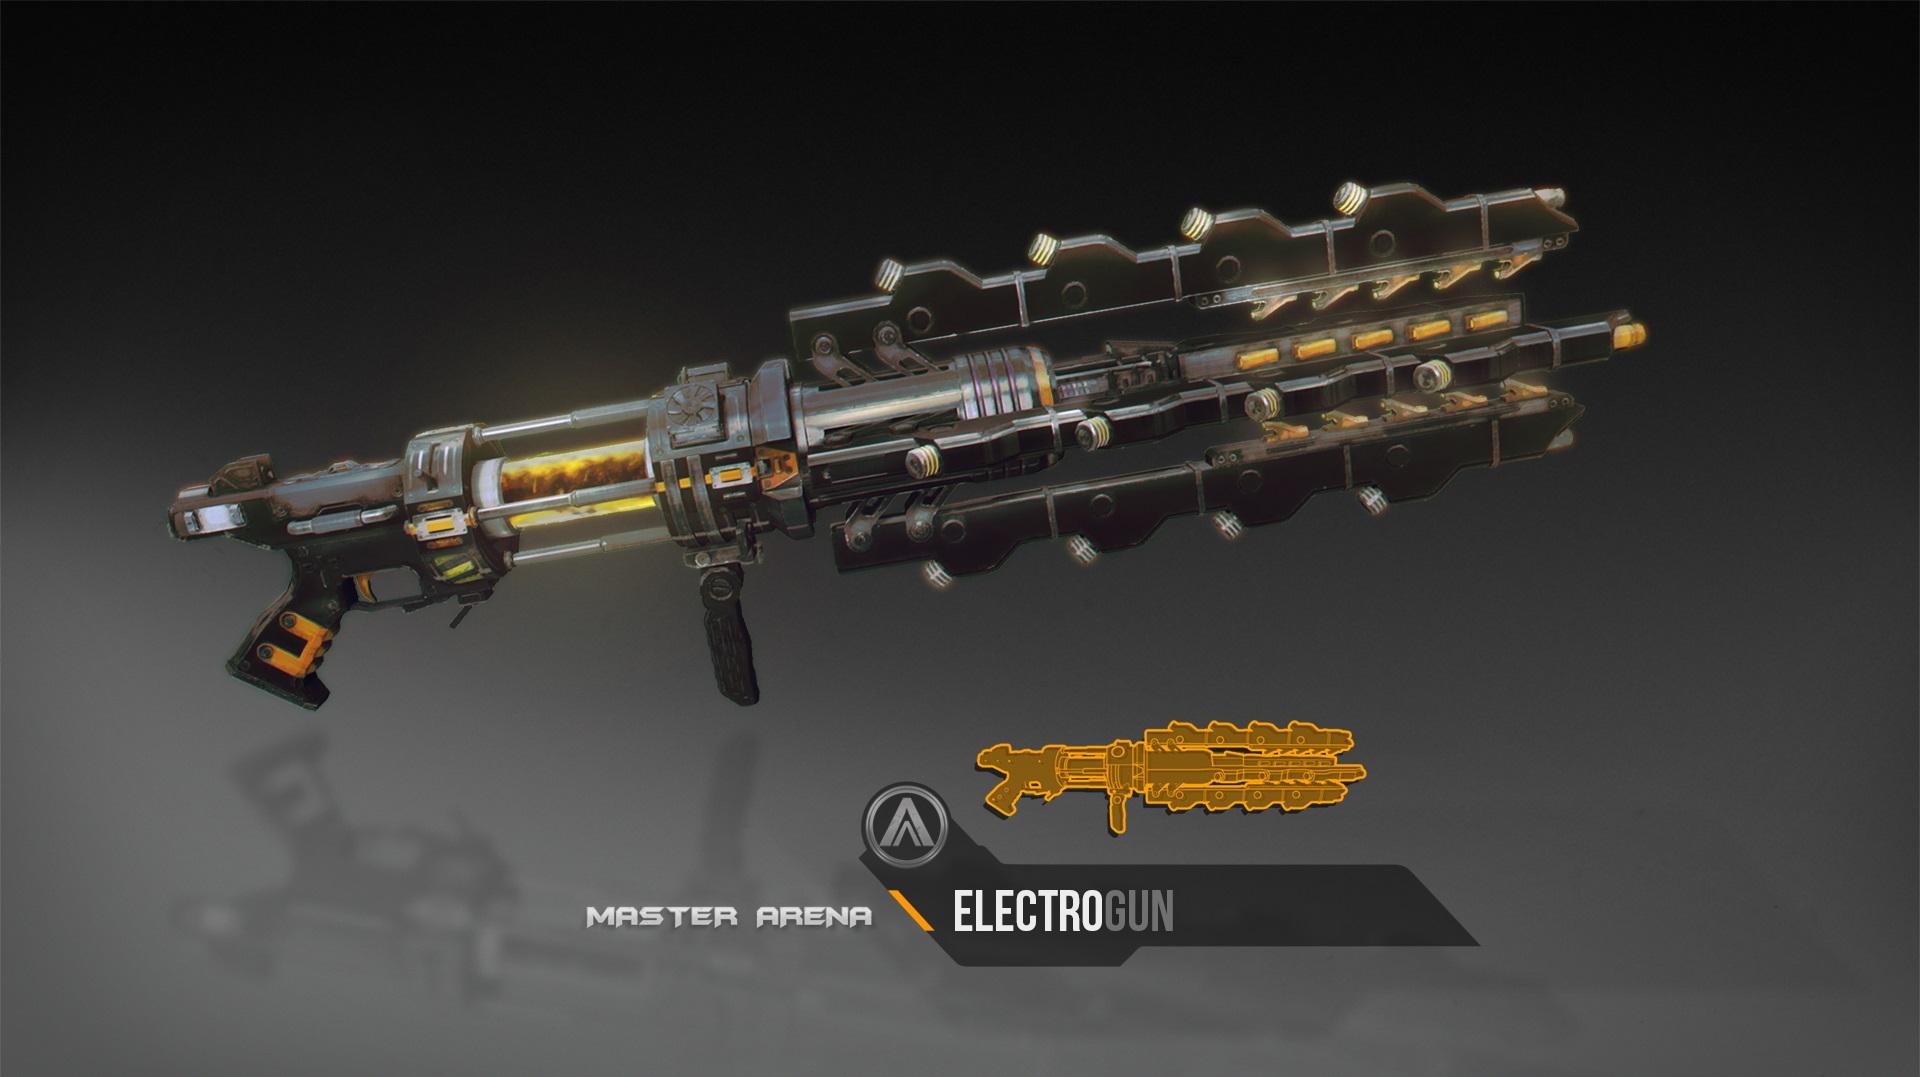 Electrogun